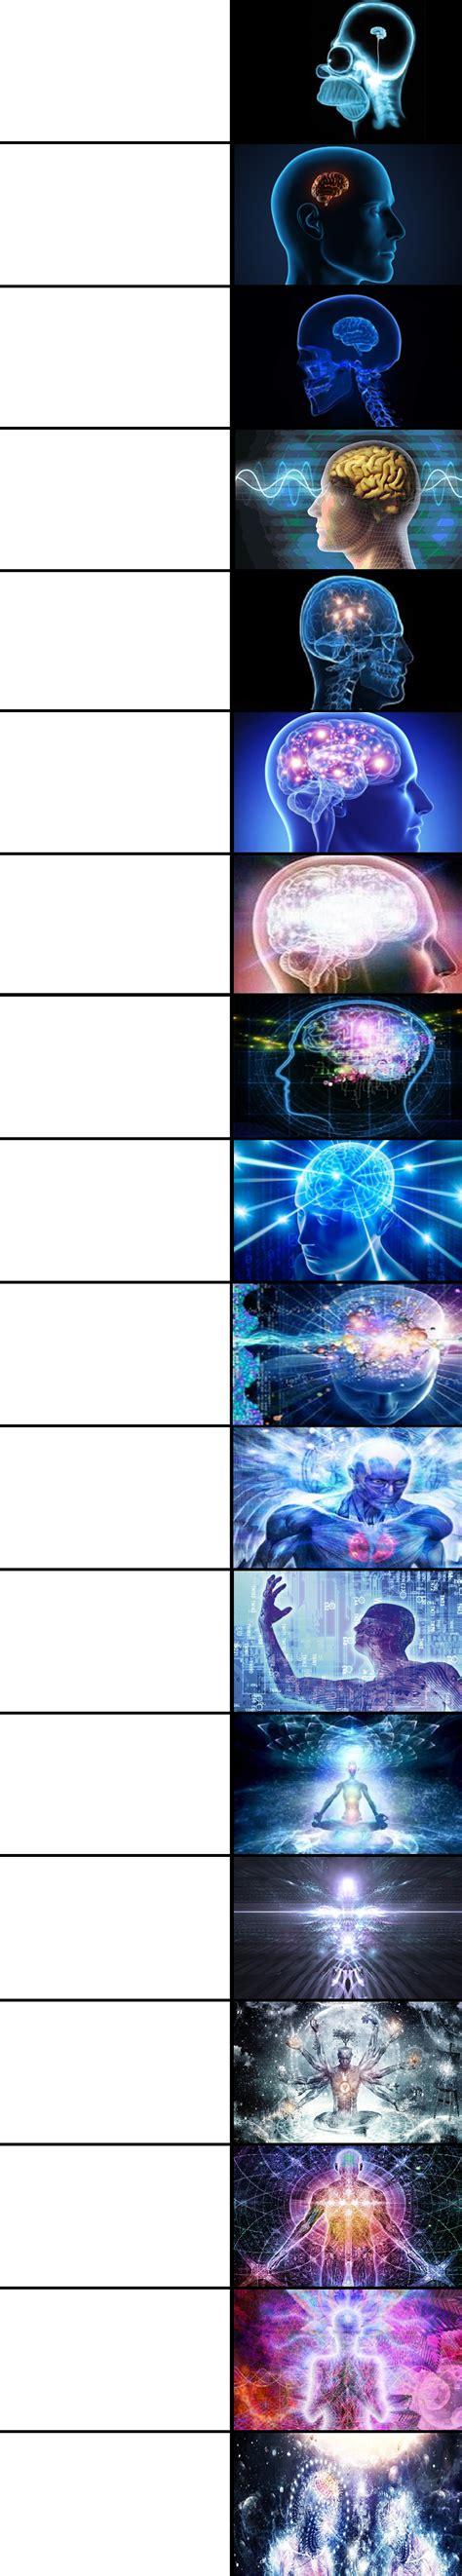 meme template expanding template delicious soft drinks mmm sluurrp